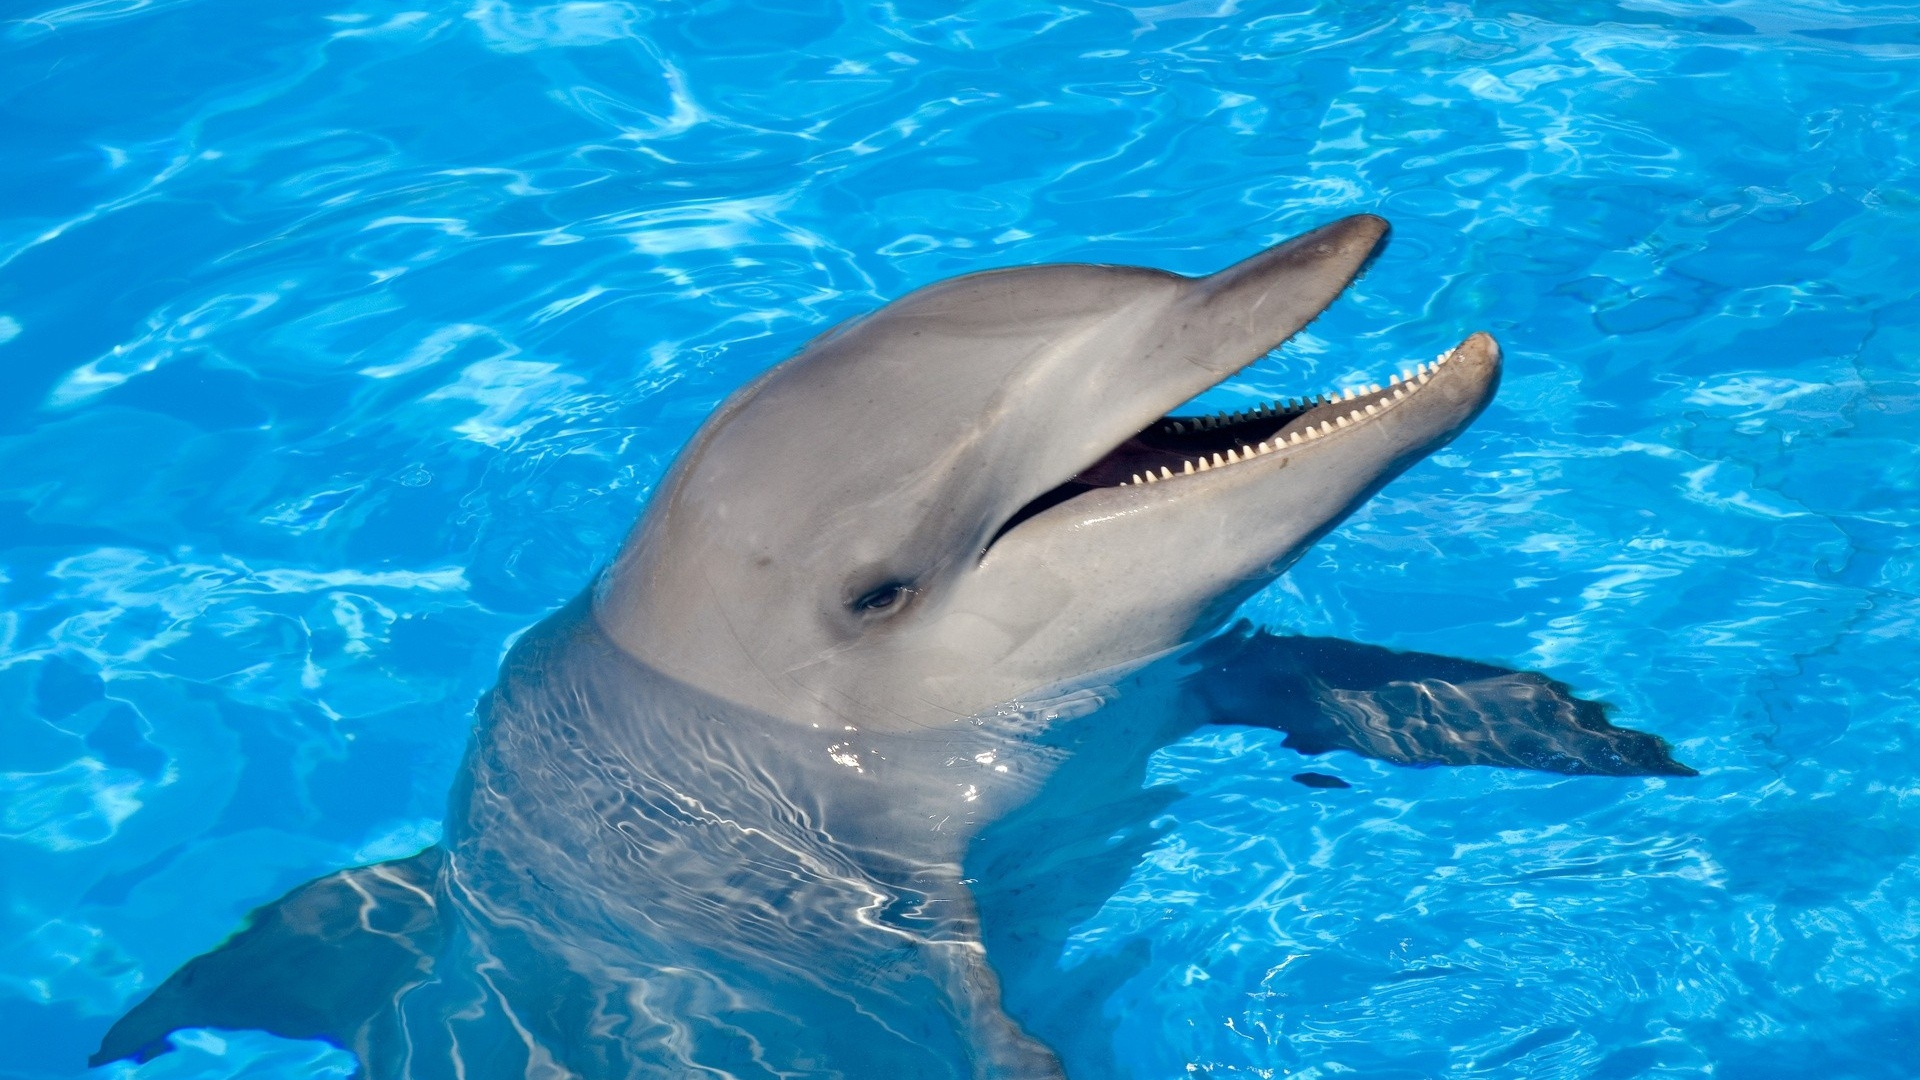 Dolphin Wallpaper Hd 1080p Wallpapersafari